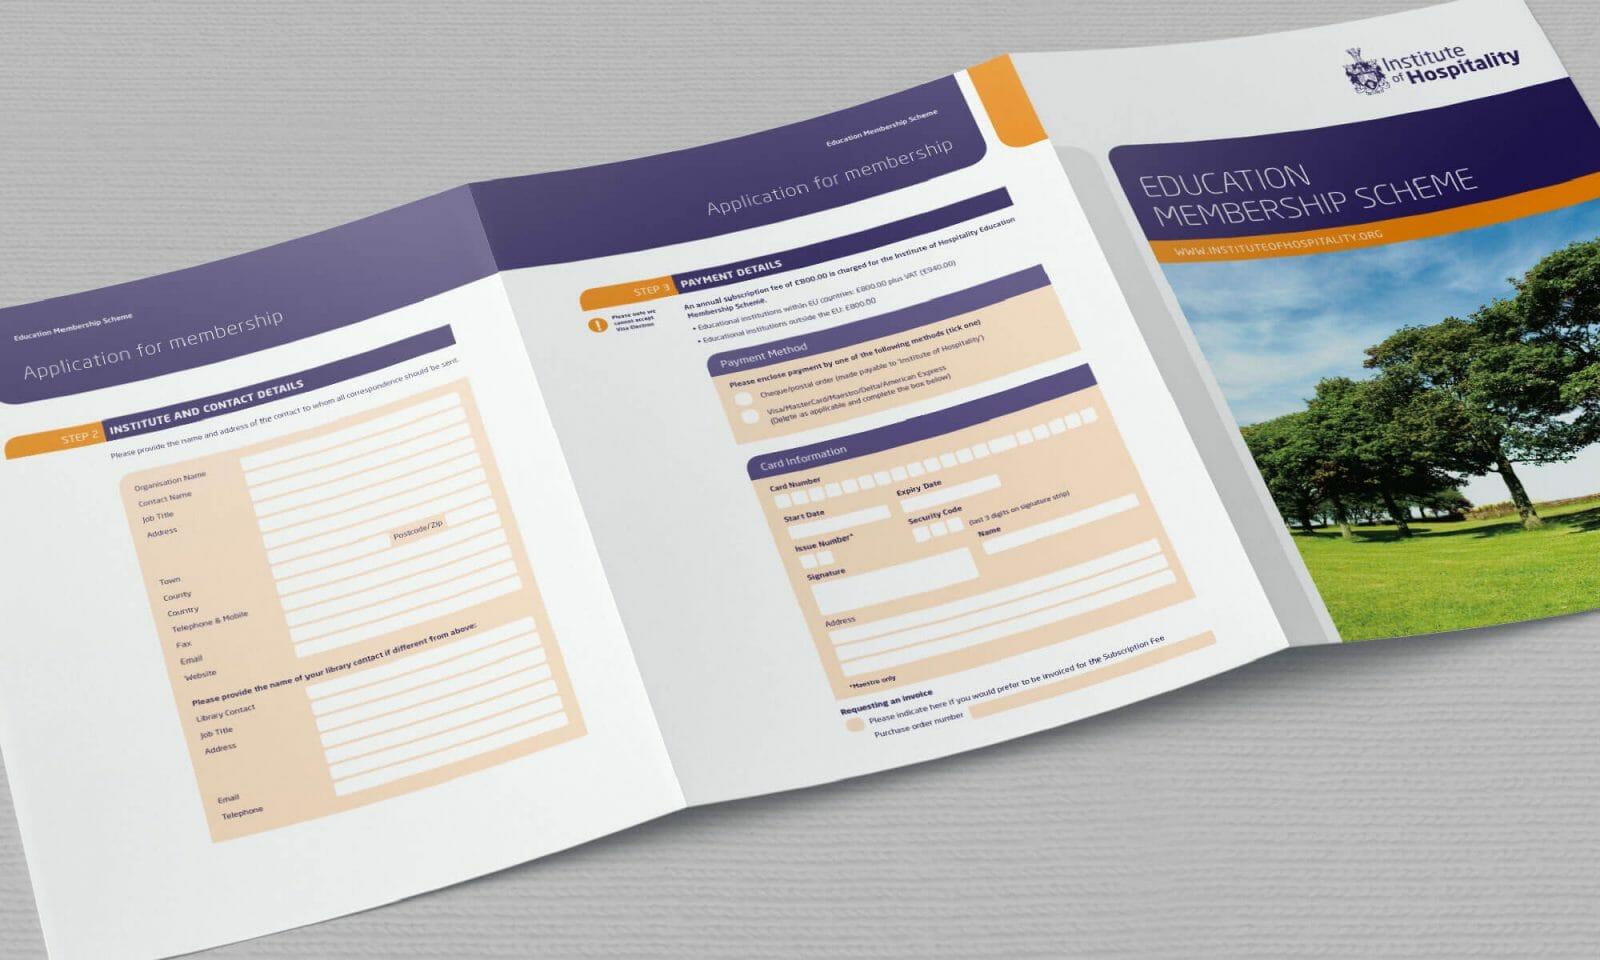 IOH education membership scheme form